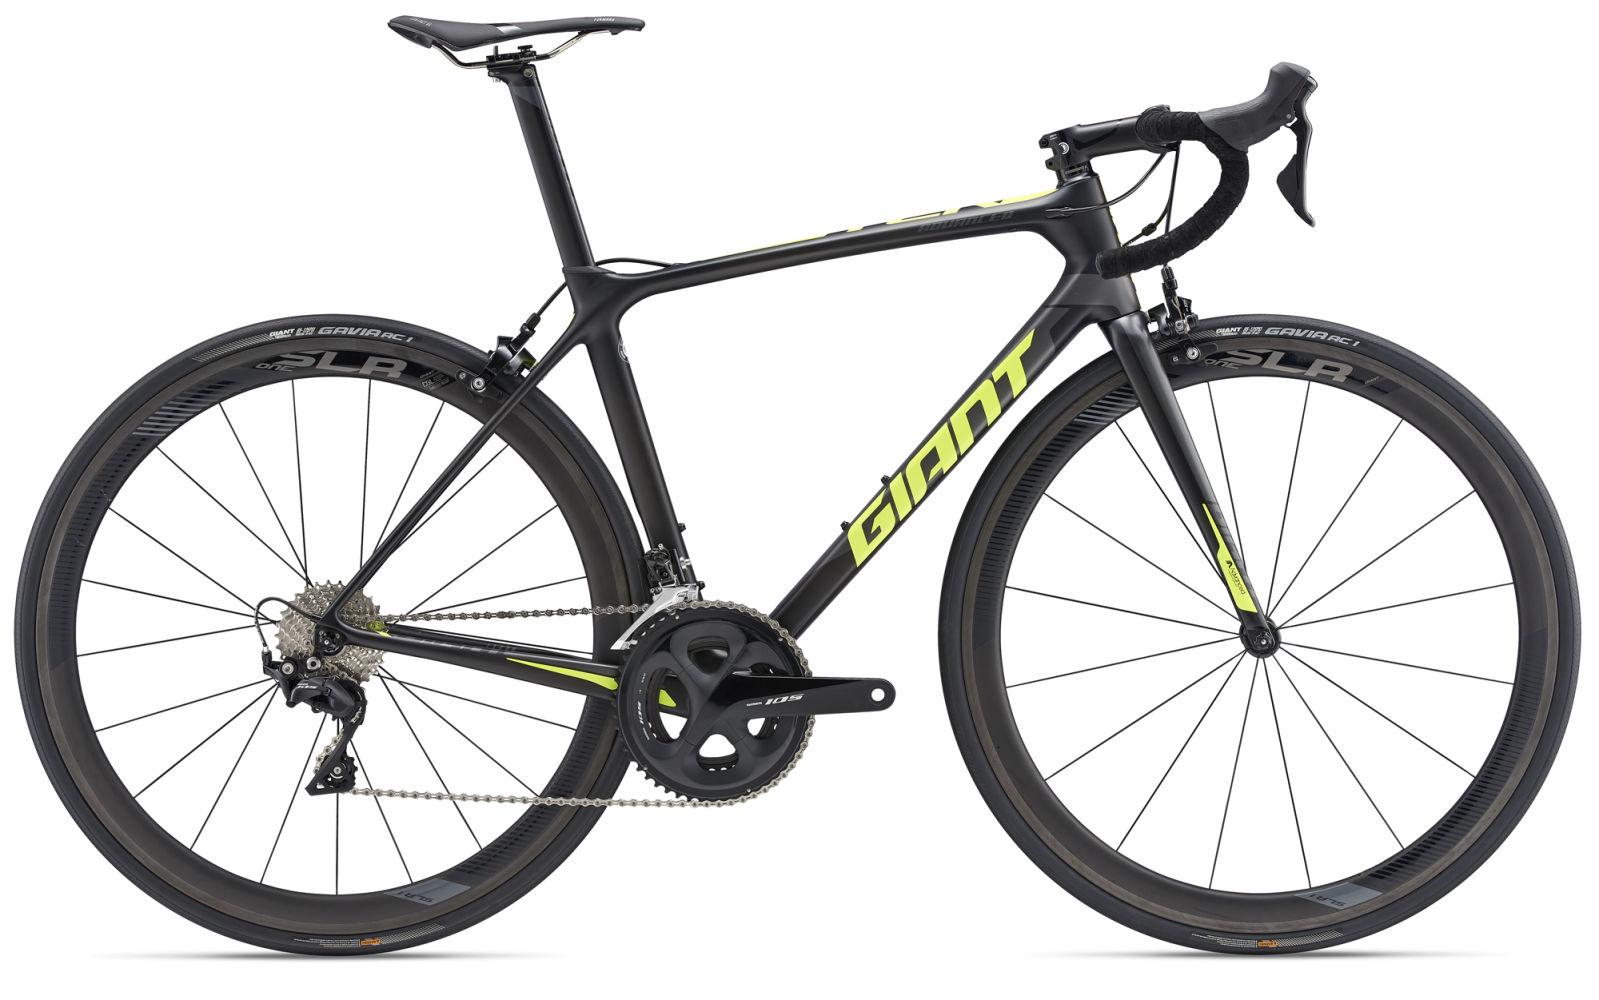 0a21ac6385b Giant TCR 2019 road bike range explained - Cycling Weekly